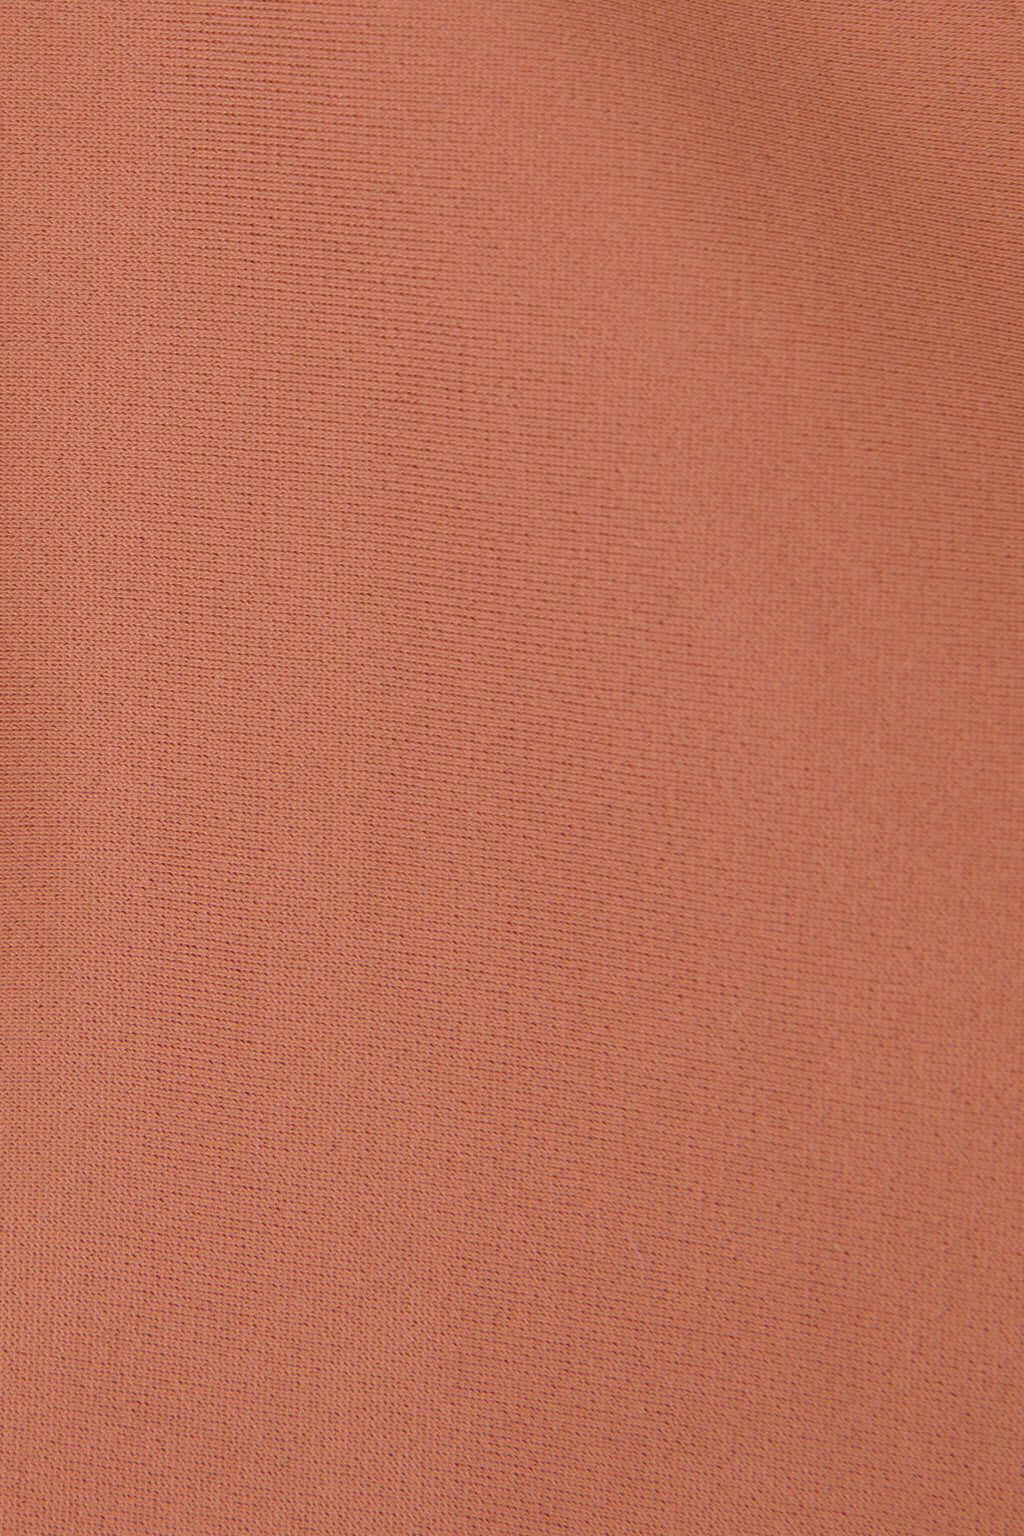 Bikini Top 2906 Terracotta 13